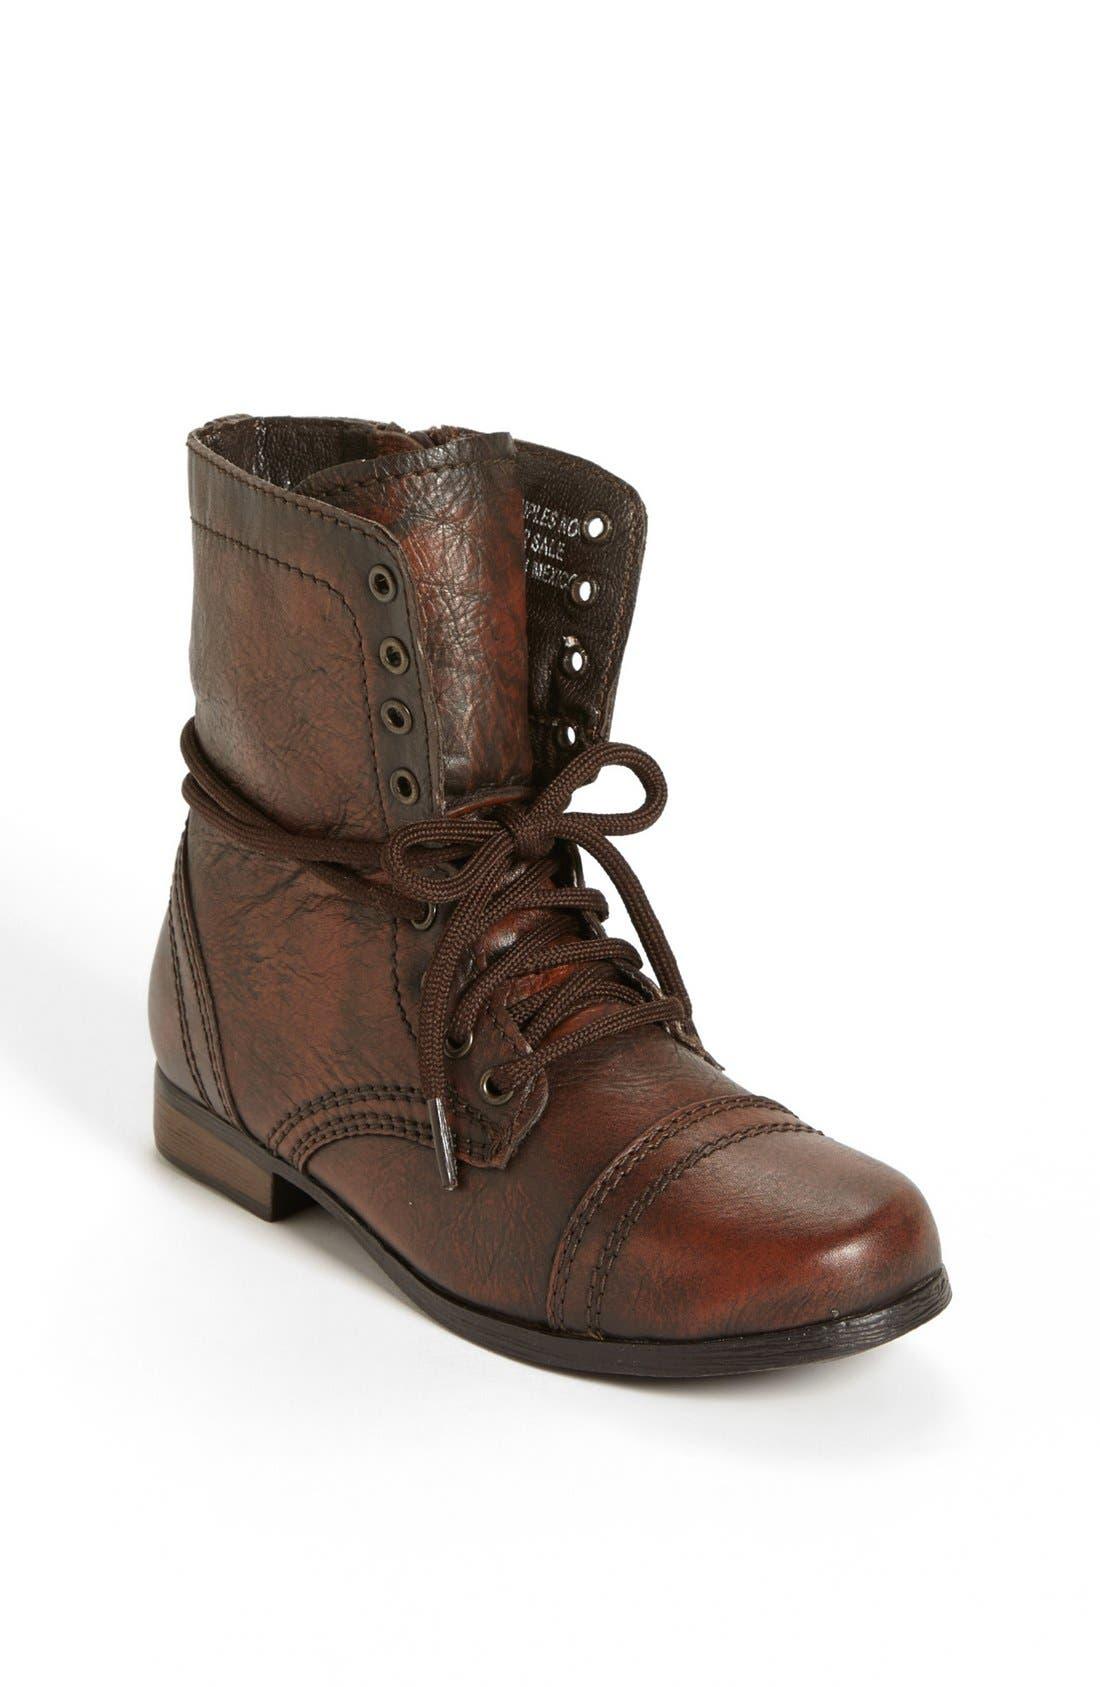 Alternate Image 1 Selected - Steve Madden 'Troopa' Boot (Toddler, Little Kid & Big Kid)